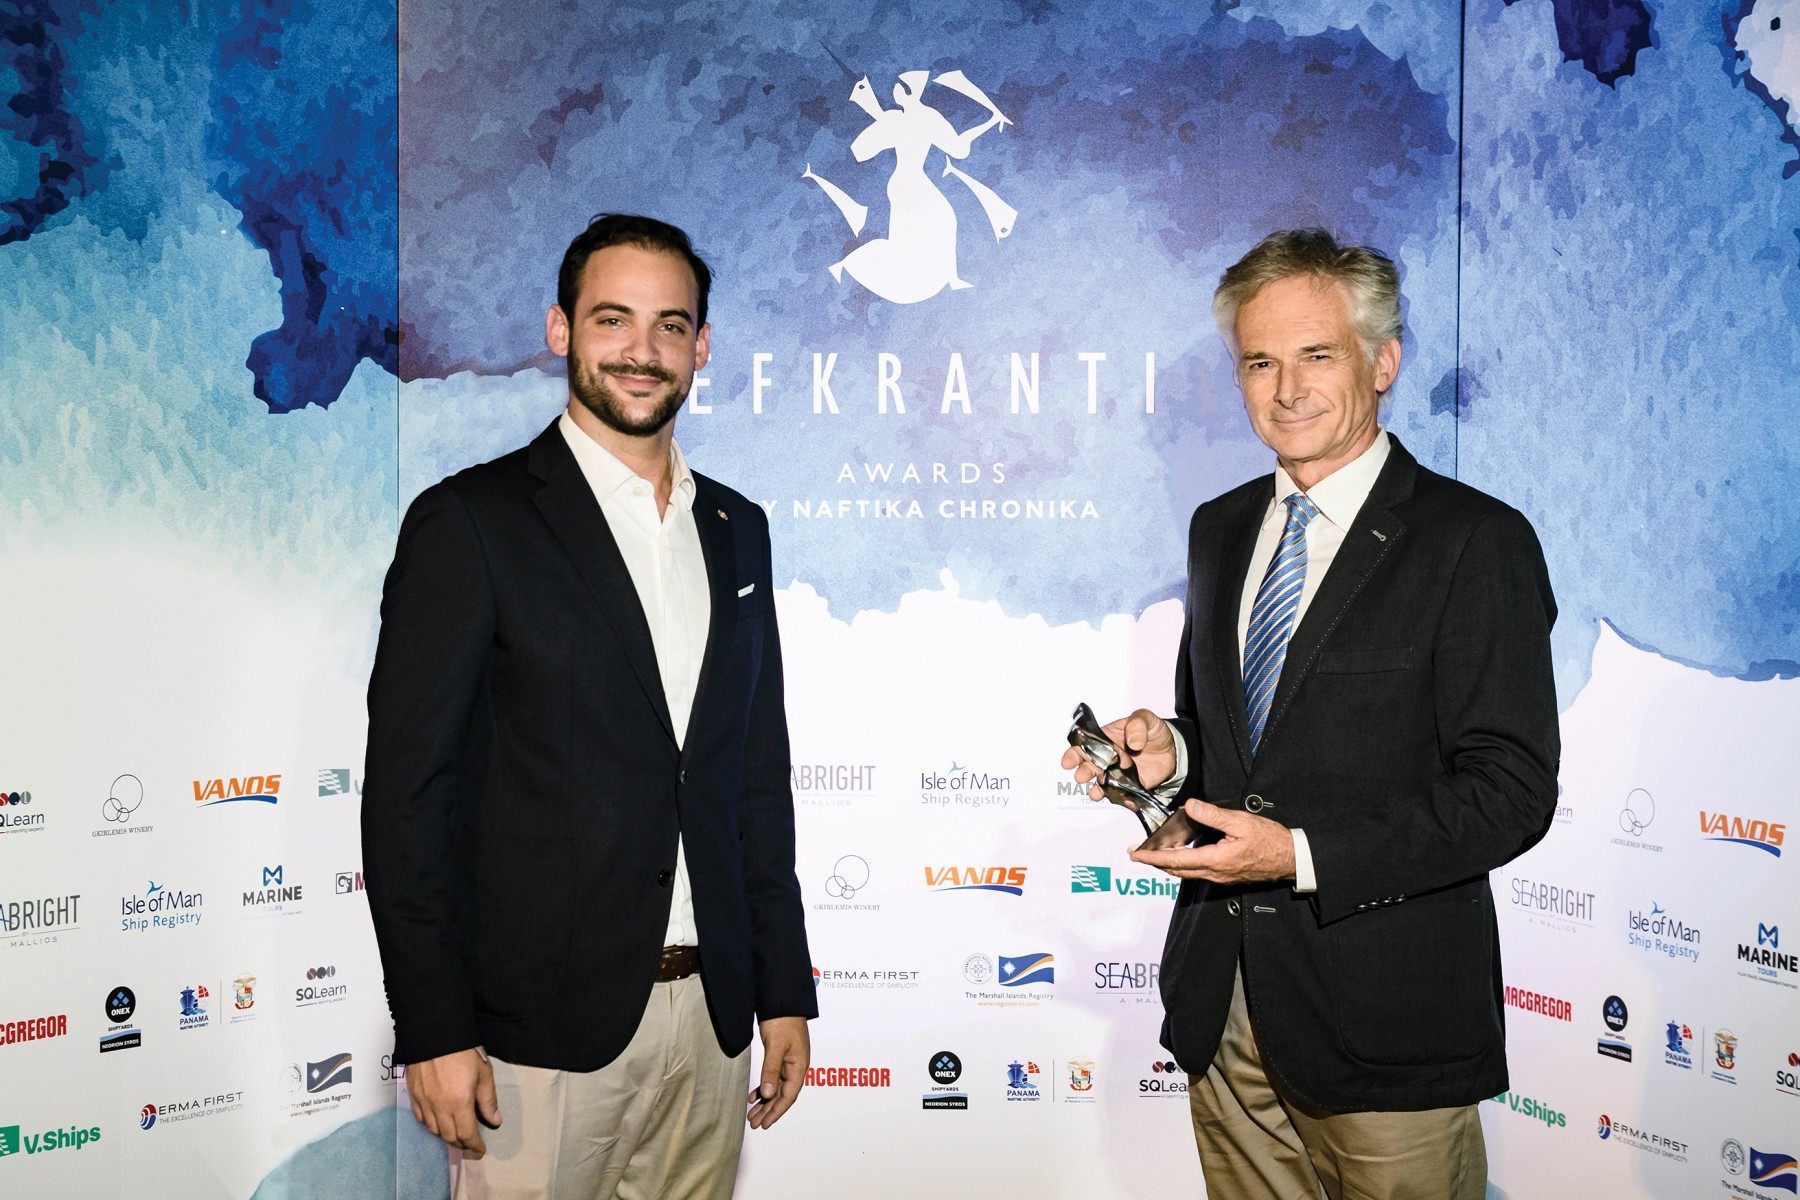 O κ. Μιλτιάδης Συννεφιάς, Technical Director της Pleiades Shipping Agents S.A., παραλαμβάνει το αγαλματίδιο «Ευκράντη» από τον κ. Ηλία Μάλλιο, Υπεύθυνο Εξαγωγών της Seabrigt